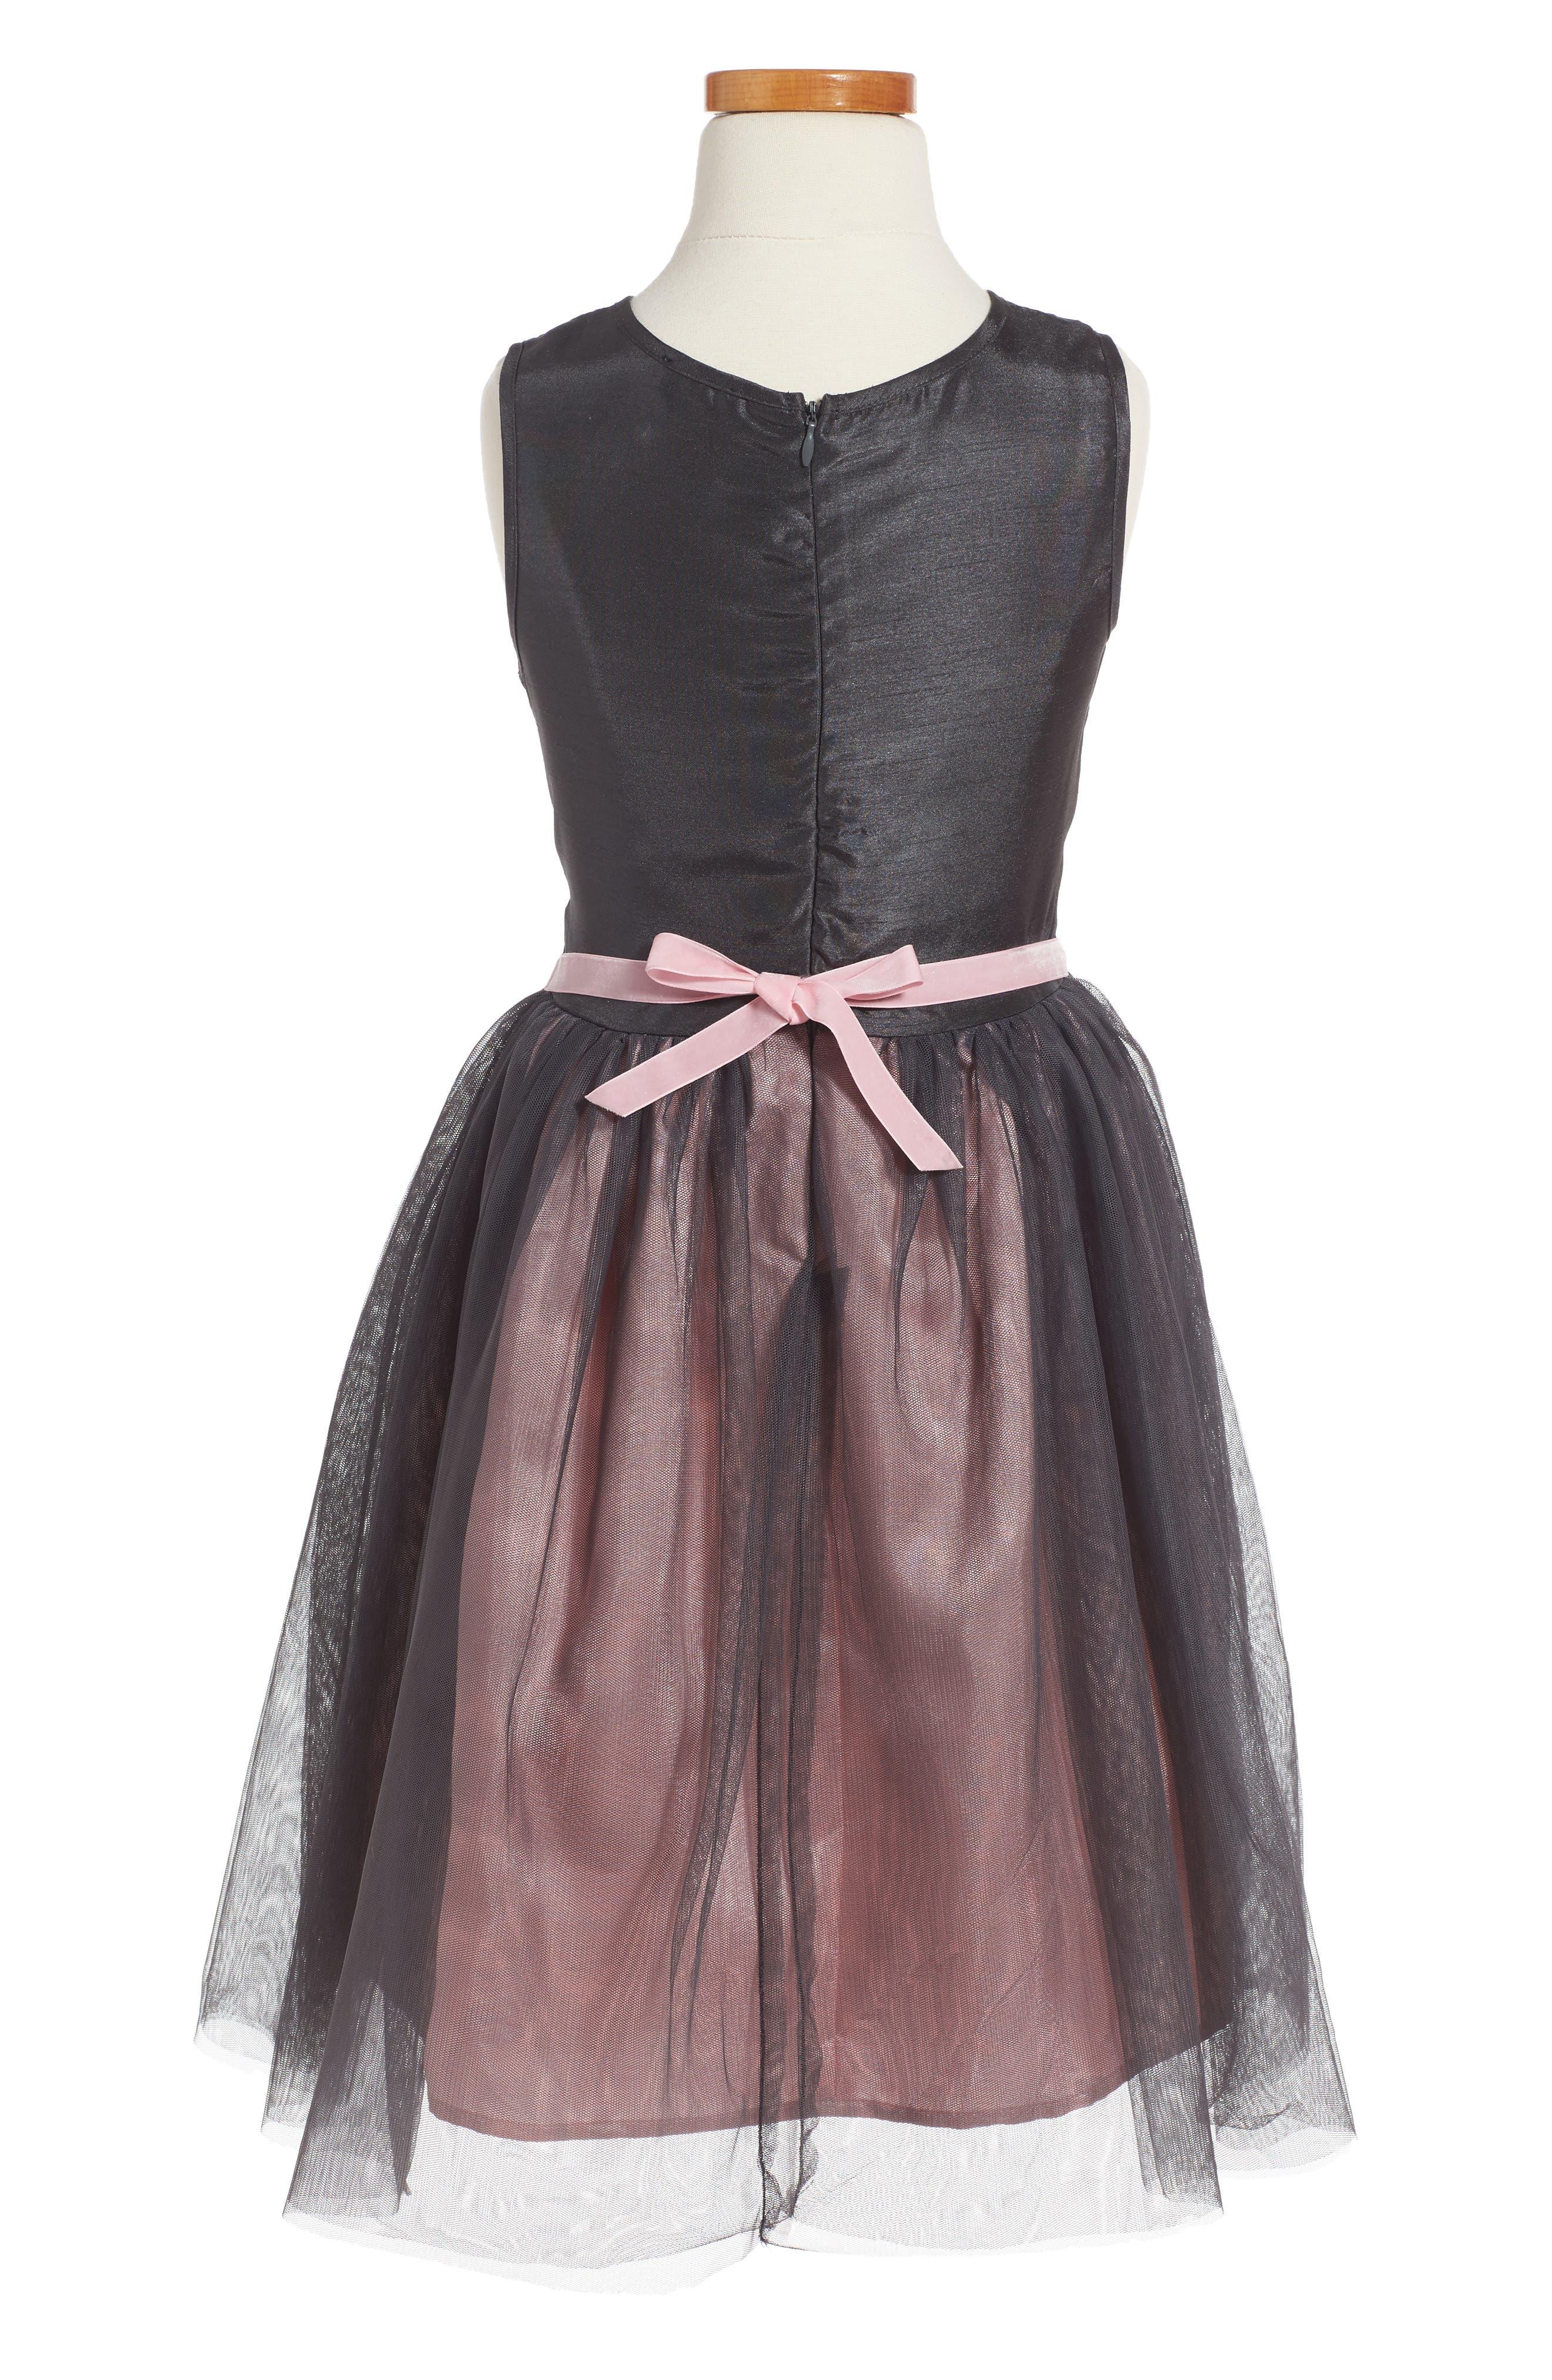 Alternate Image 2  - Zunie Embroidered Fit & Flare Dress (Toddler Girls, Little Girls & Big Girls)